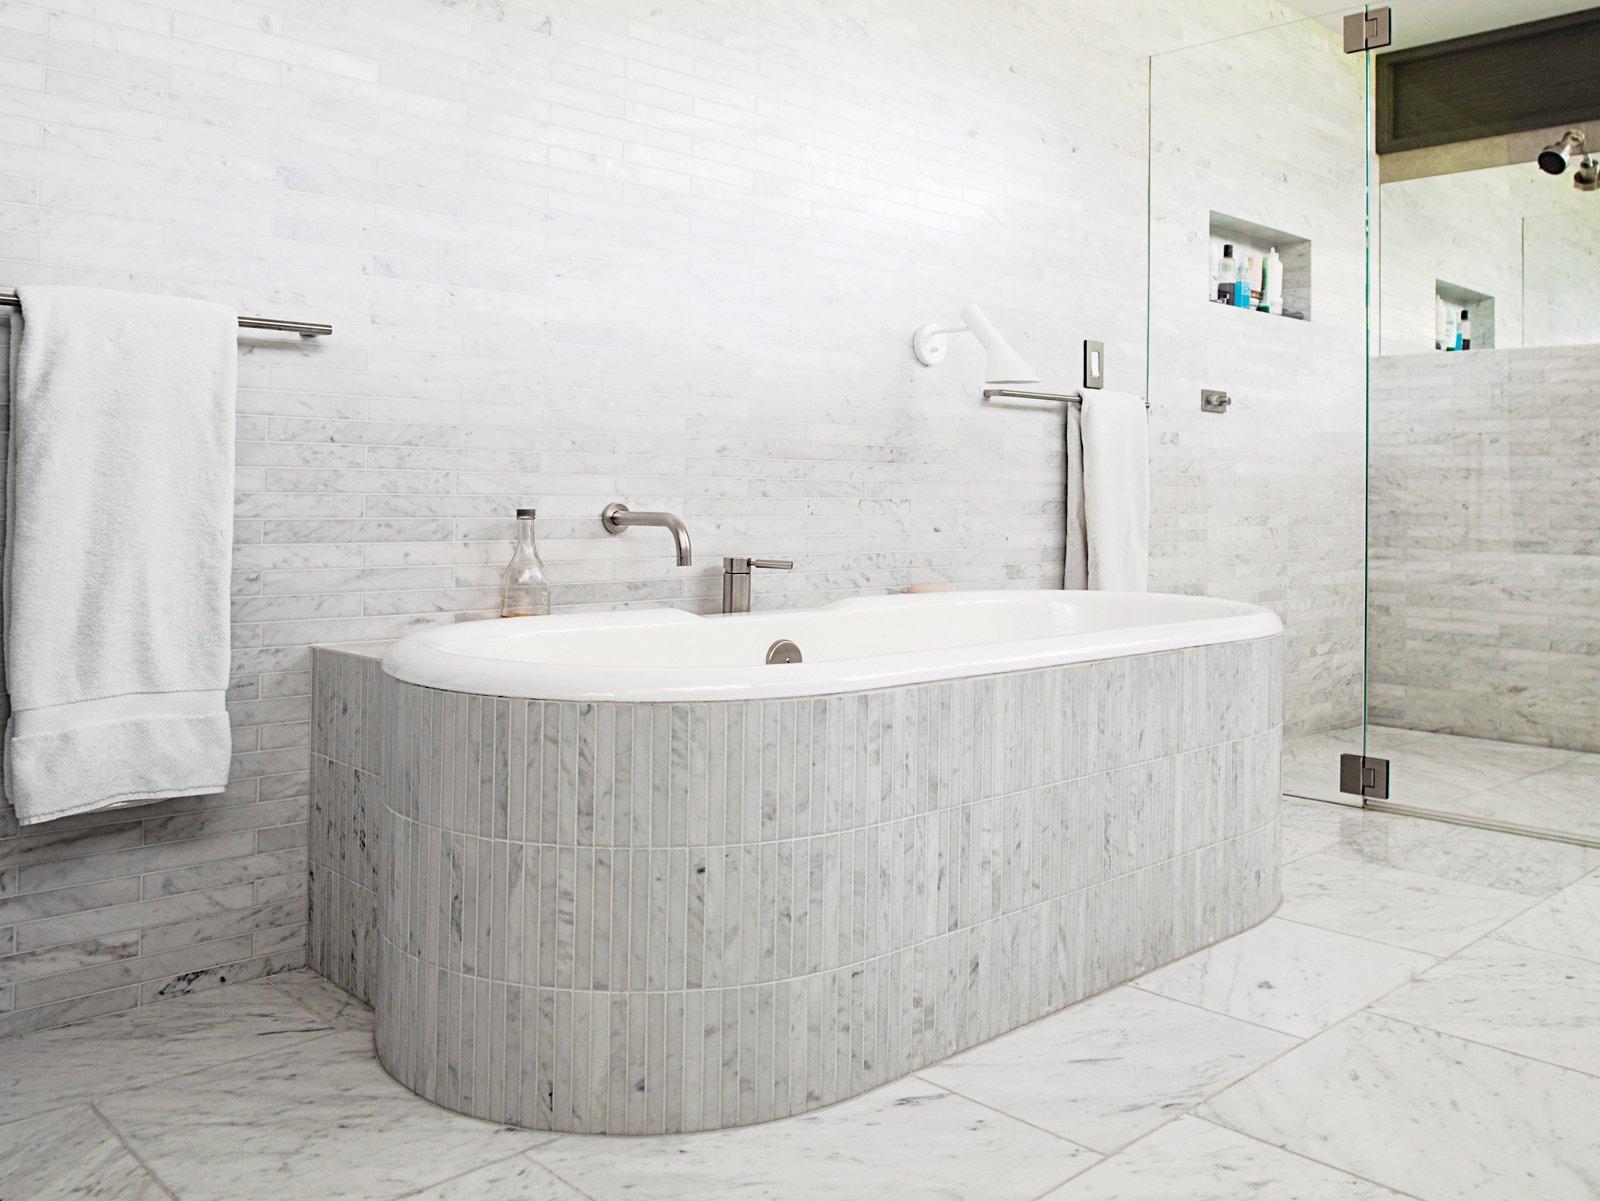 Master bath  The Deam House by Lara Deam